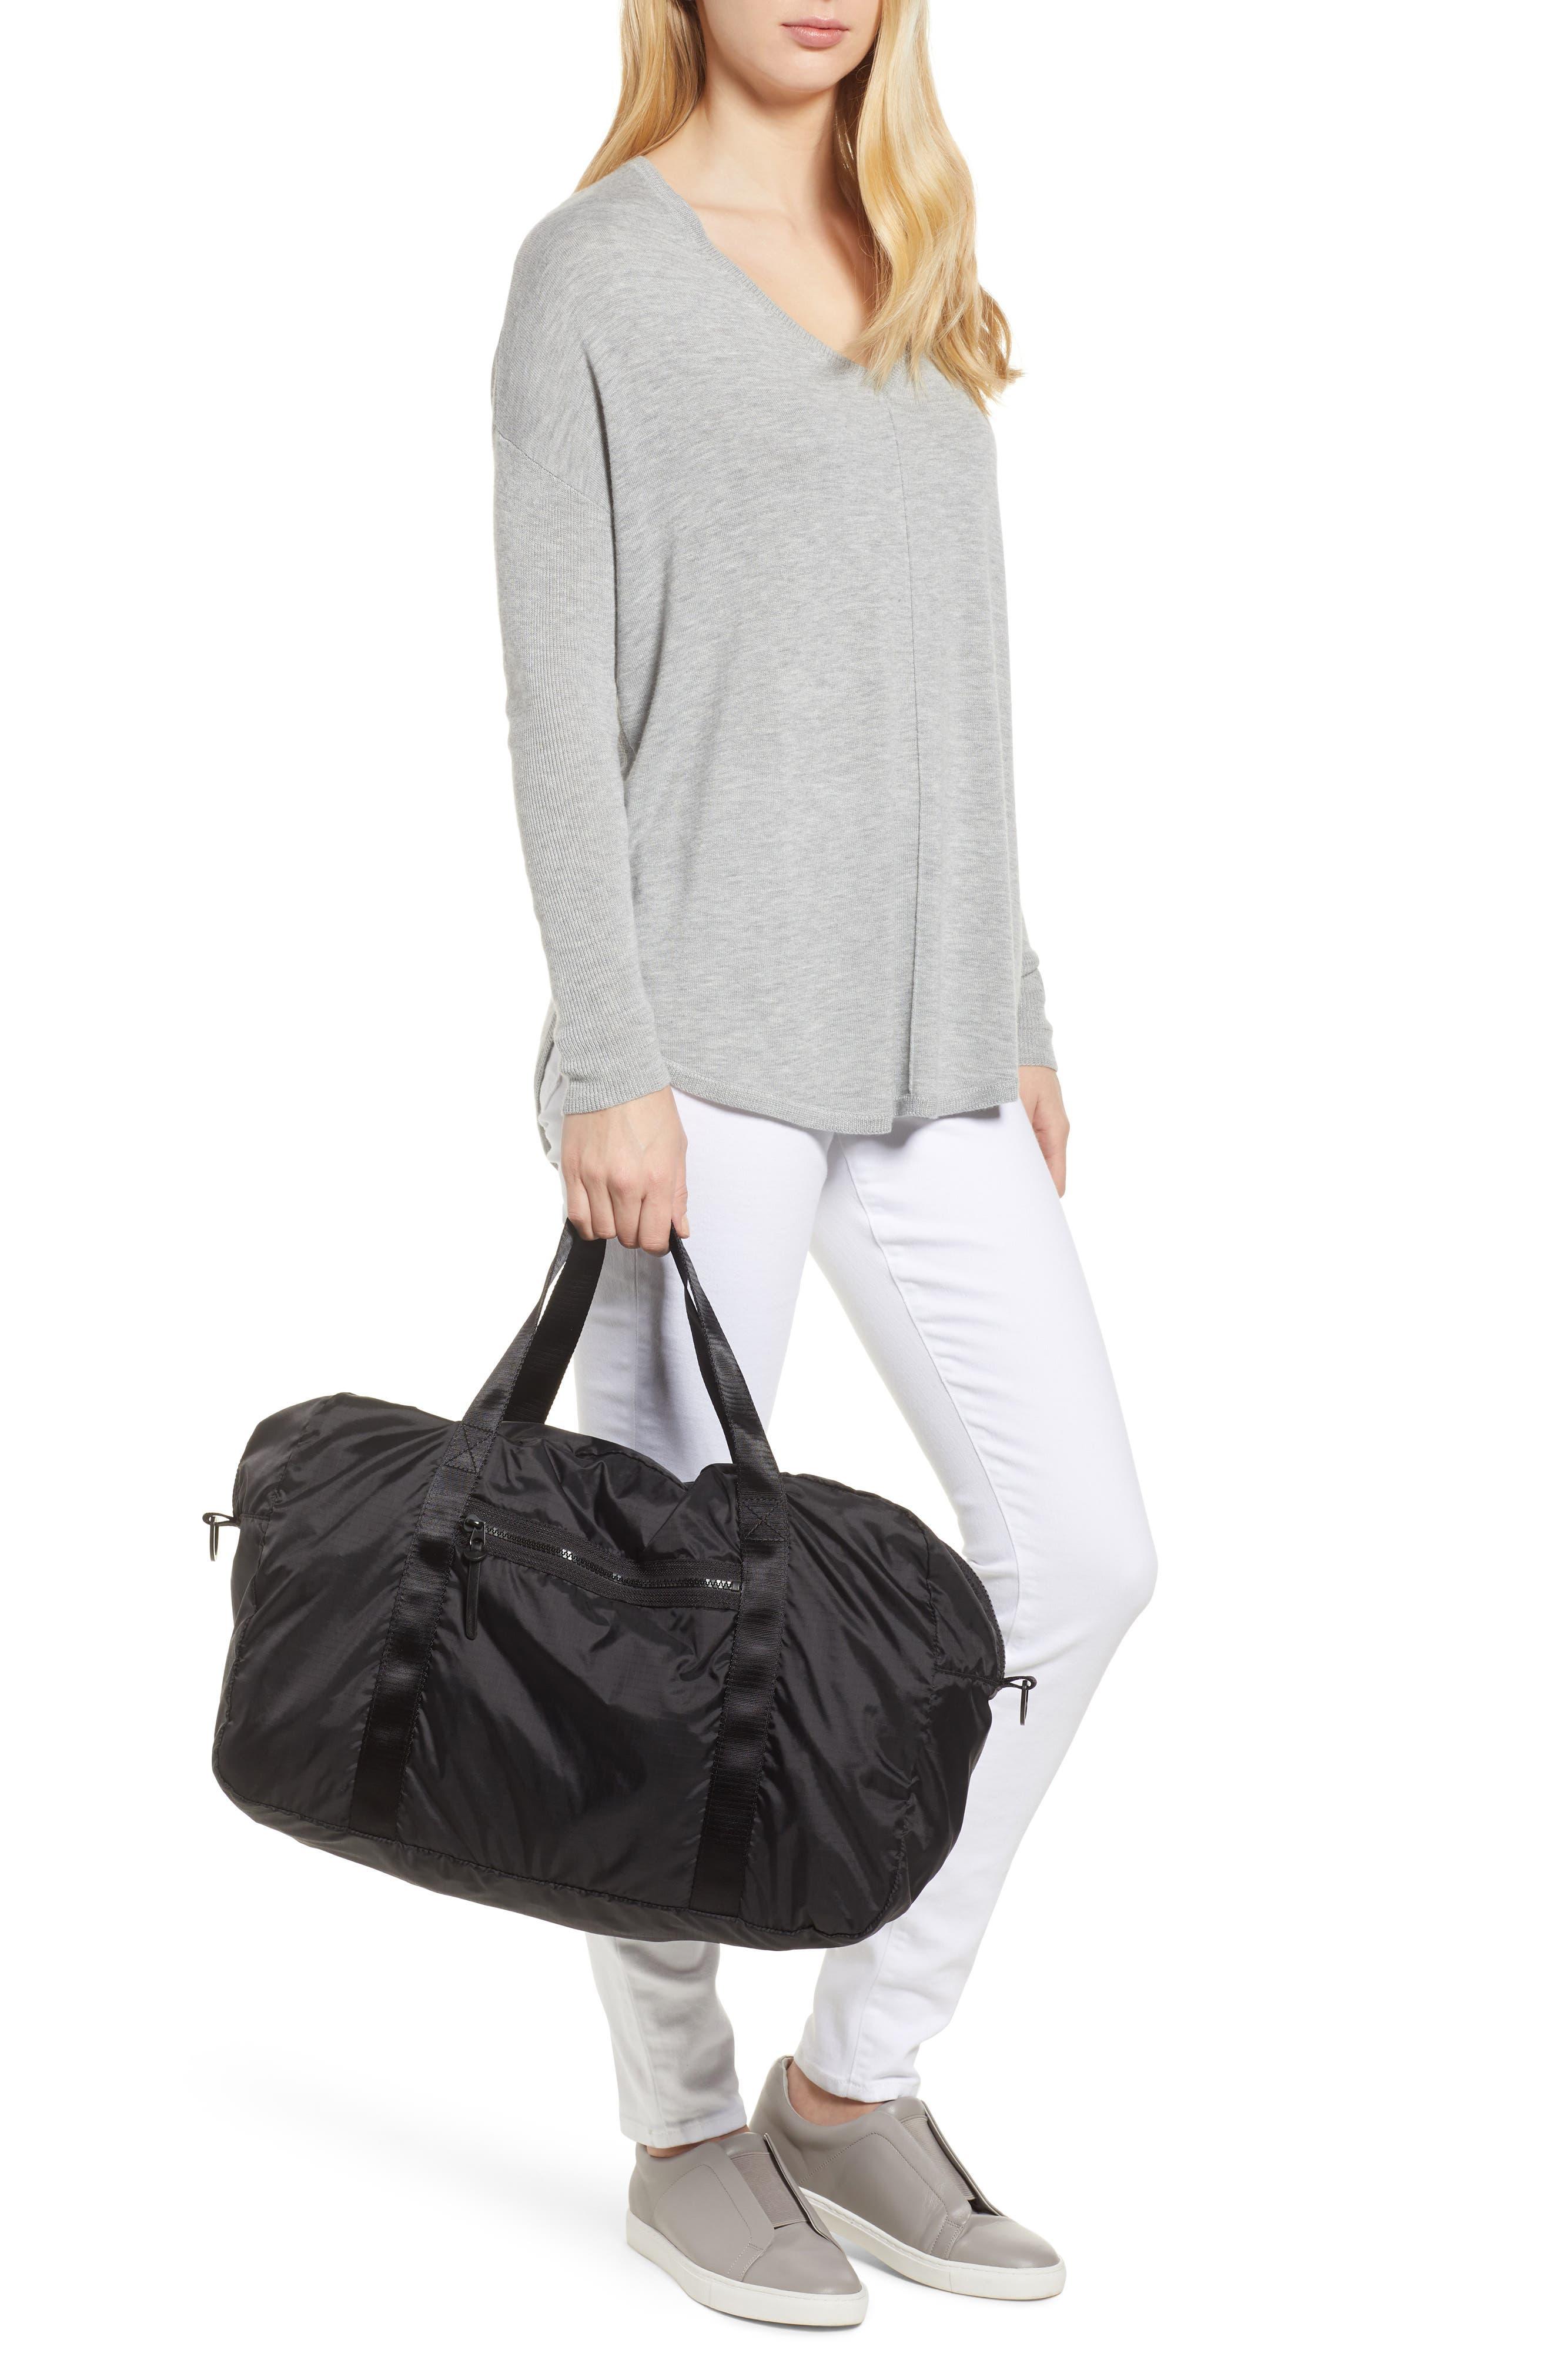 NORDSTROM, Packable Nylon Duffel Bag, Alternate thumbnail 2, color, BLACK